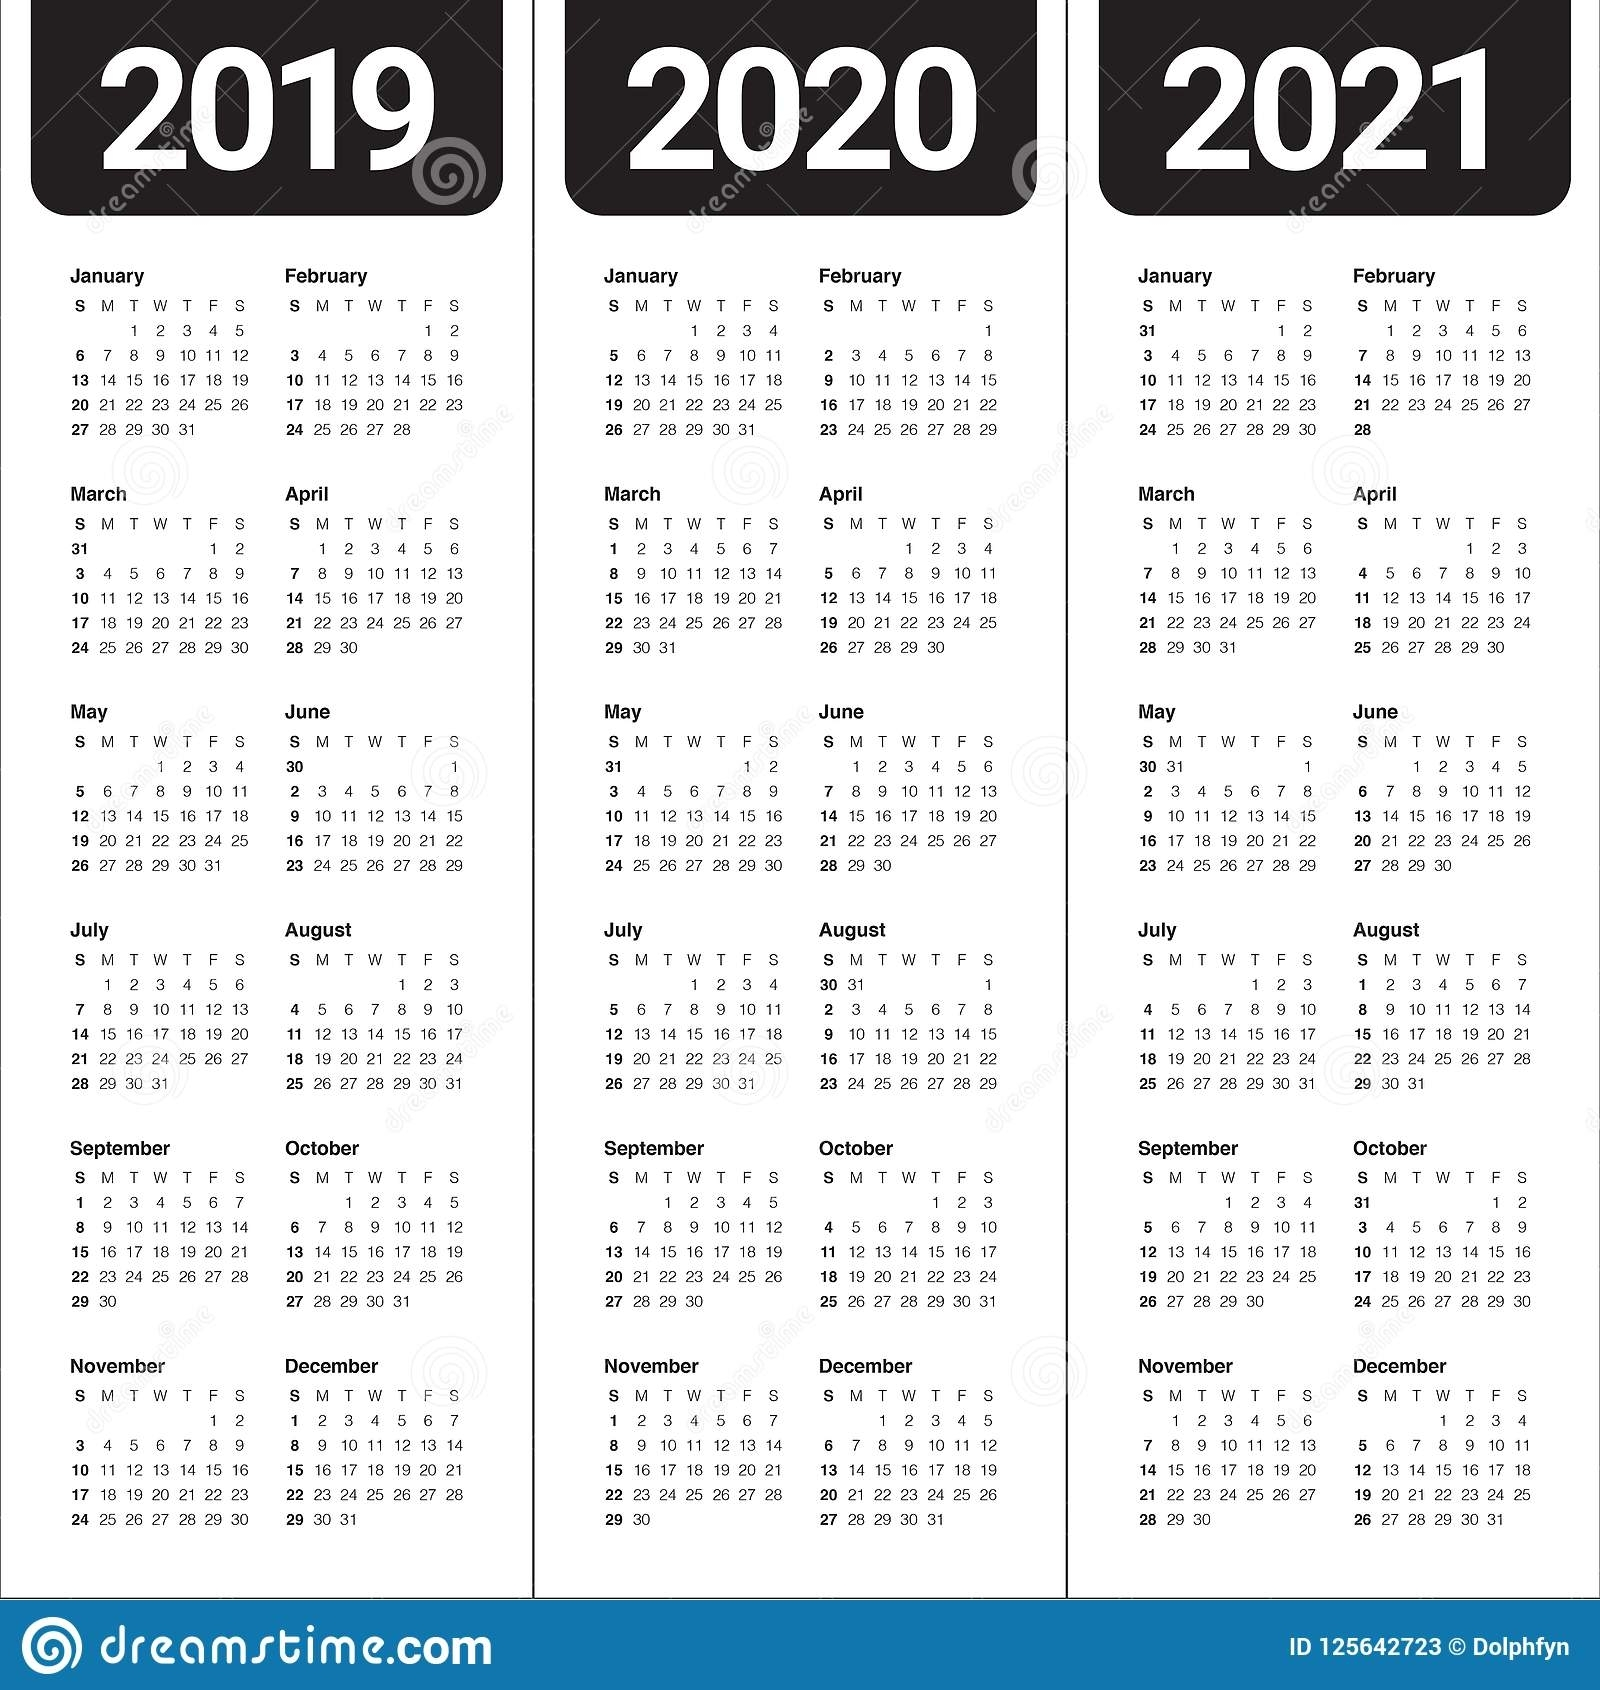 Year 2019 2020 2021 Calendar Vector Design Template Stock Vector in Three Year Calendar 2019 2020 2021